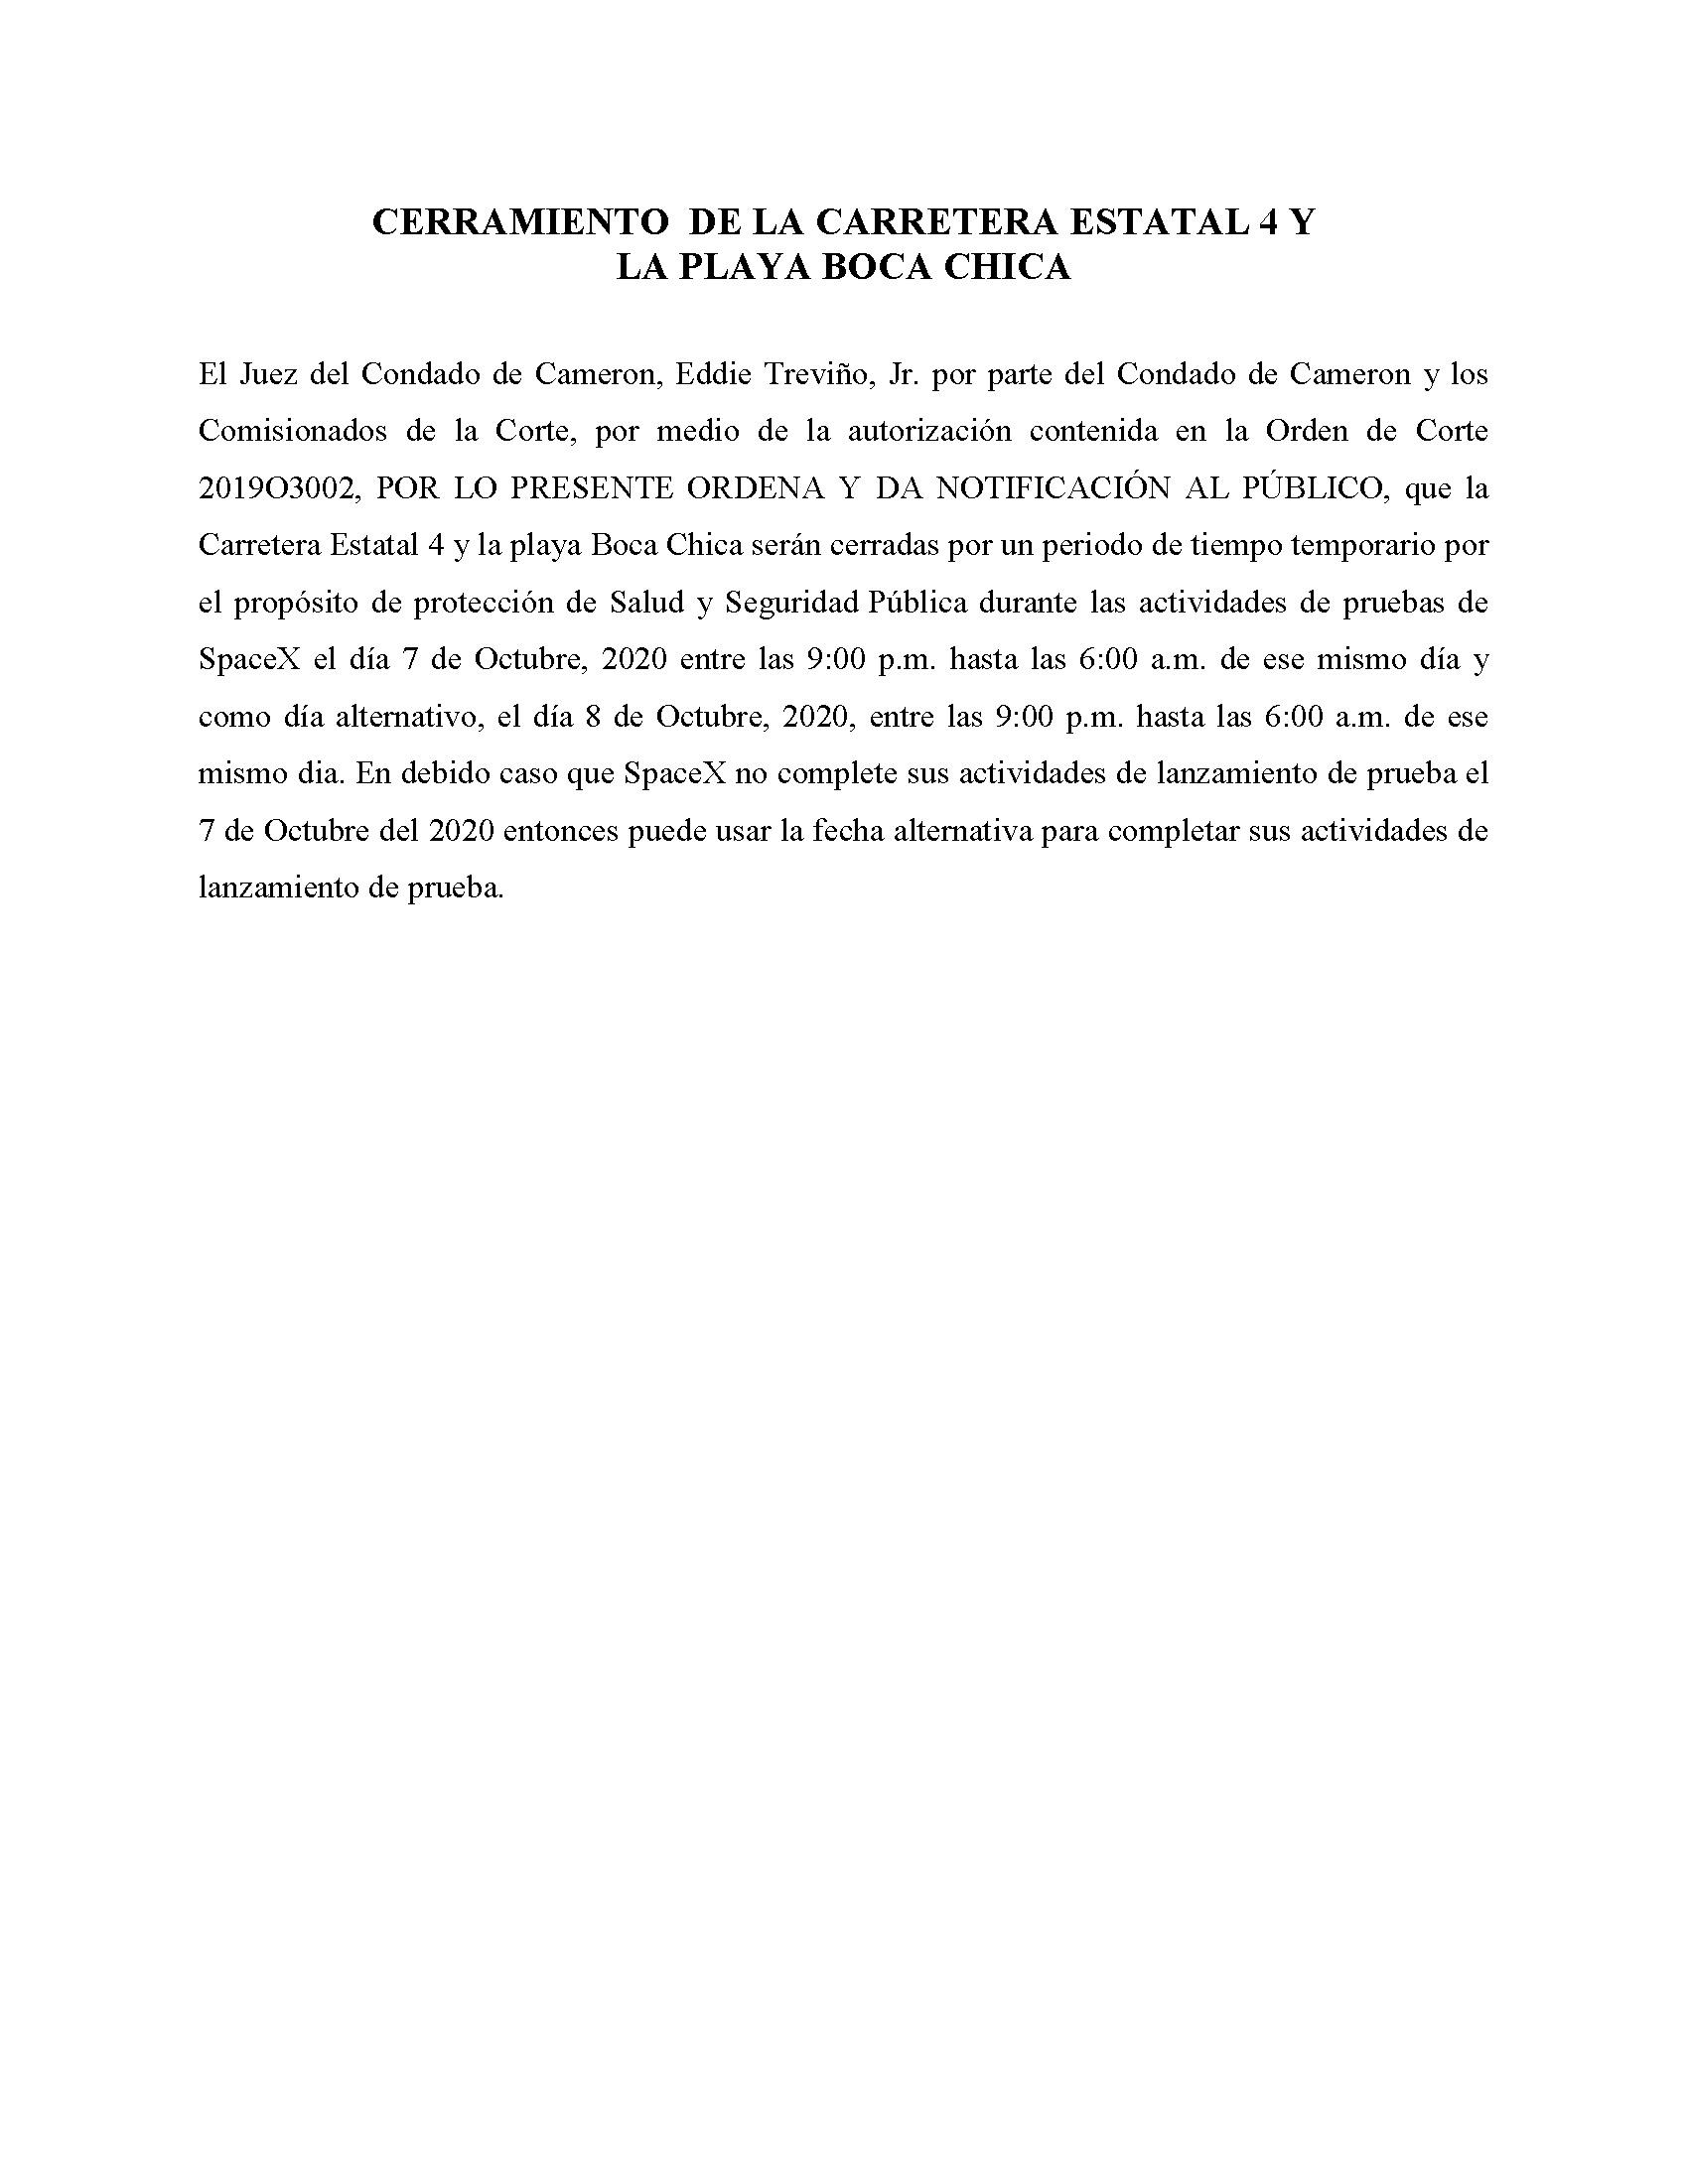 ORDER.CLOSURE OF HIGHWAY 4 Y LA PLAYA BOCA CHICA.SPANISH.10.07.20